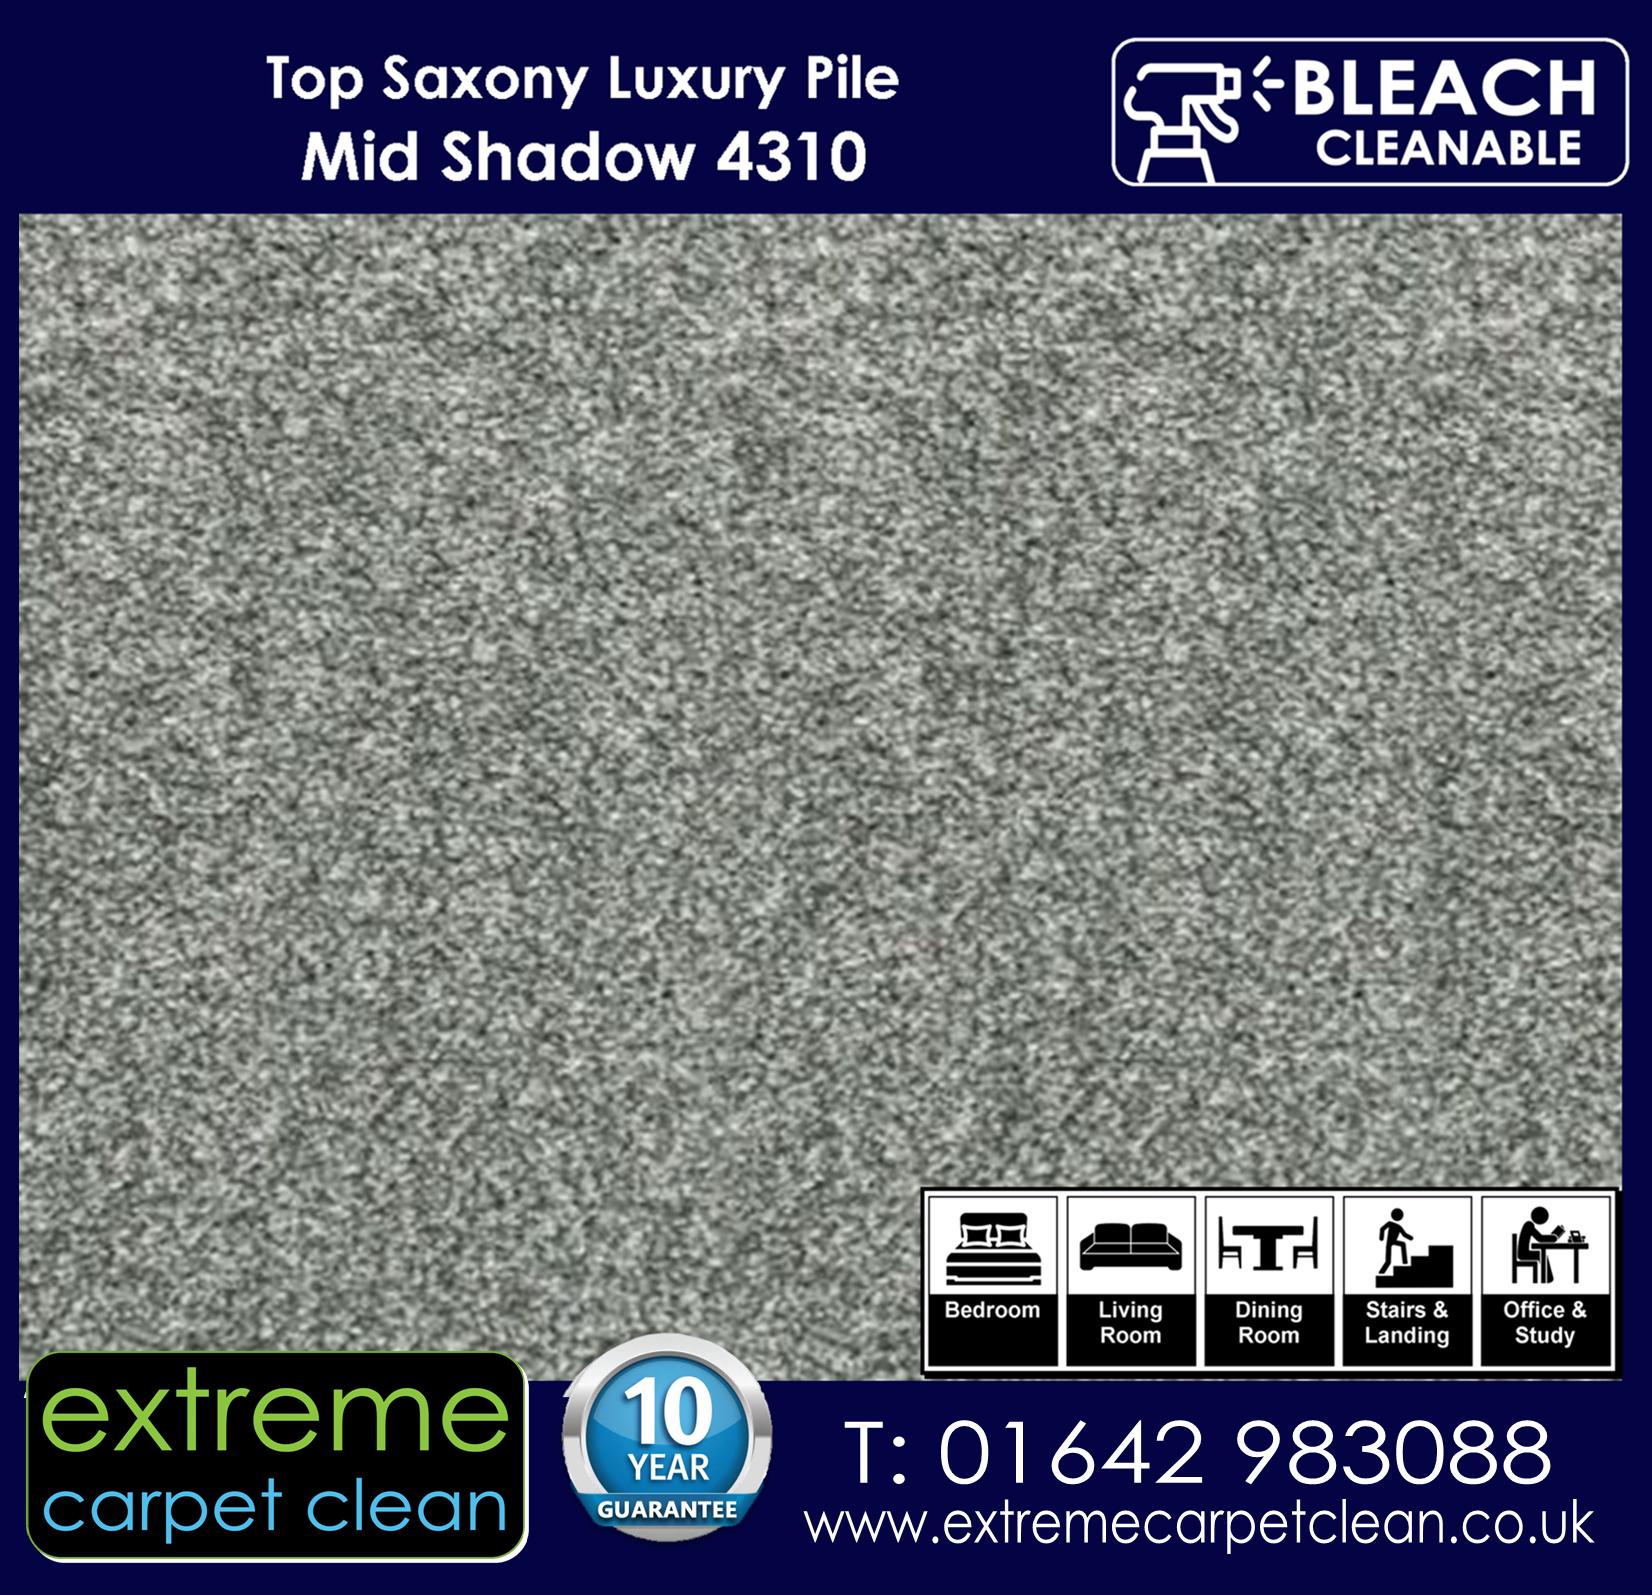 Extreme Carpet Clean Top Saxony Mid Shadow  Carpet 4310